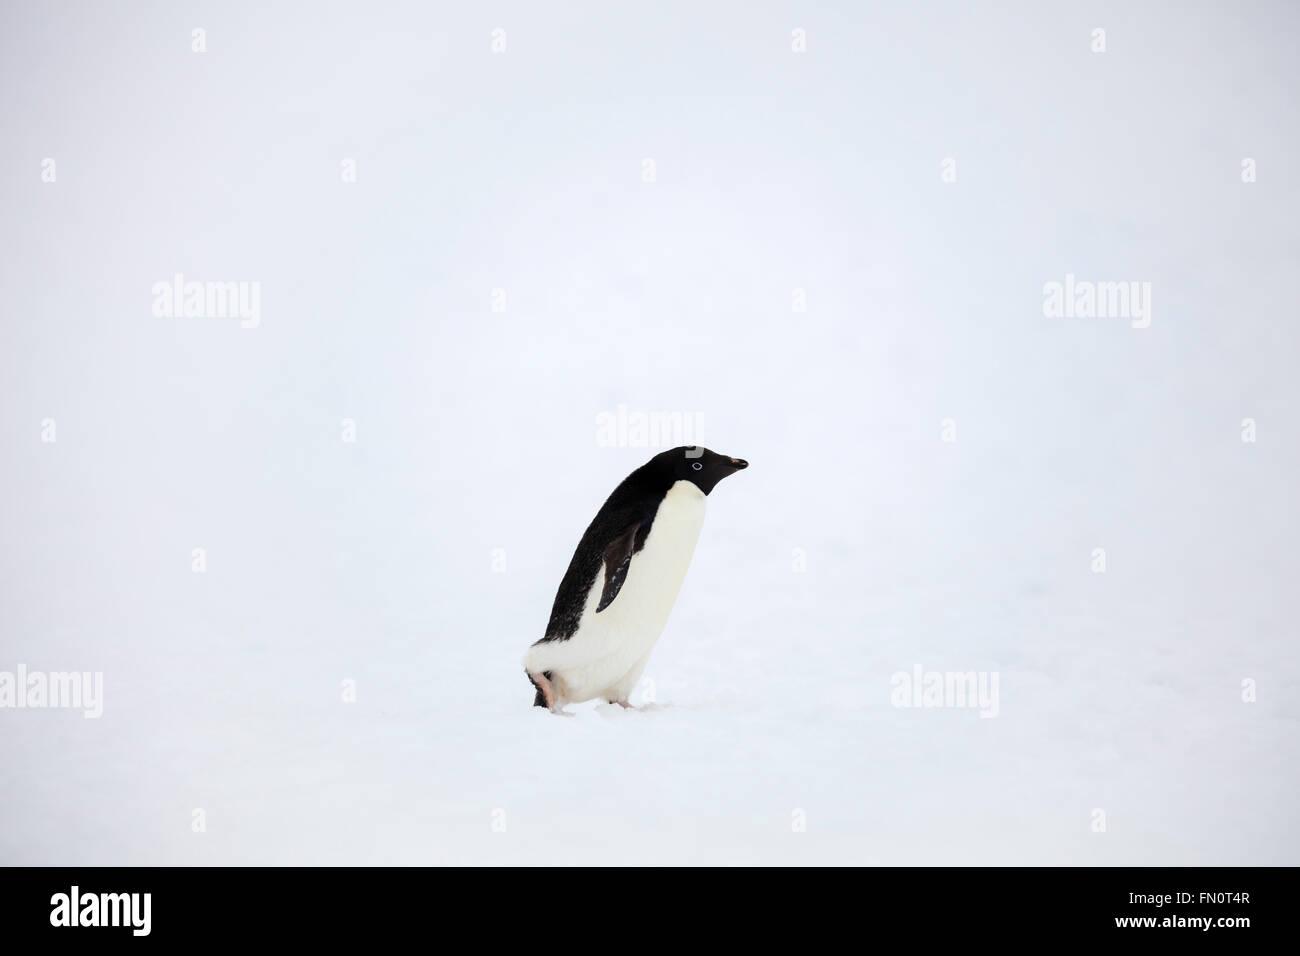 La Antártida, en la península Antártica, Isla Petermann, pingüinos Adelia, Imagen De Stock